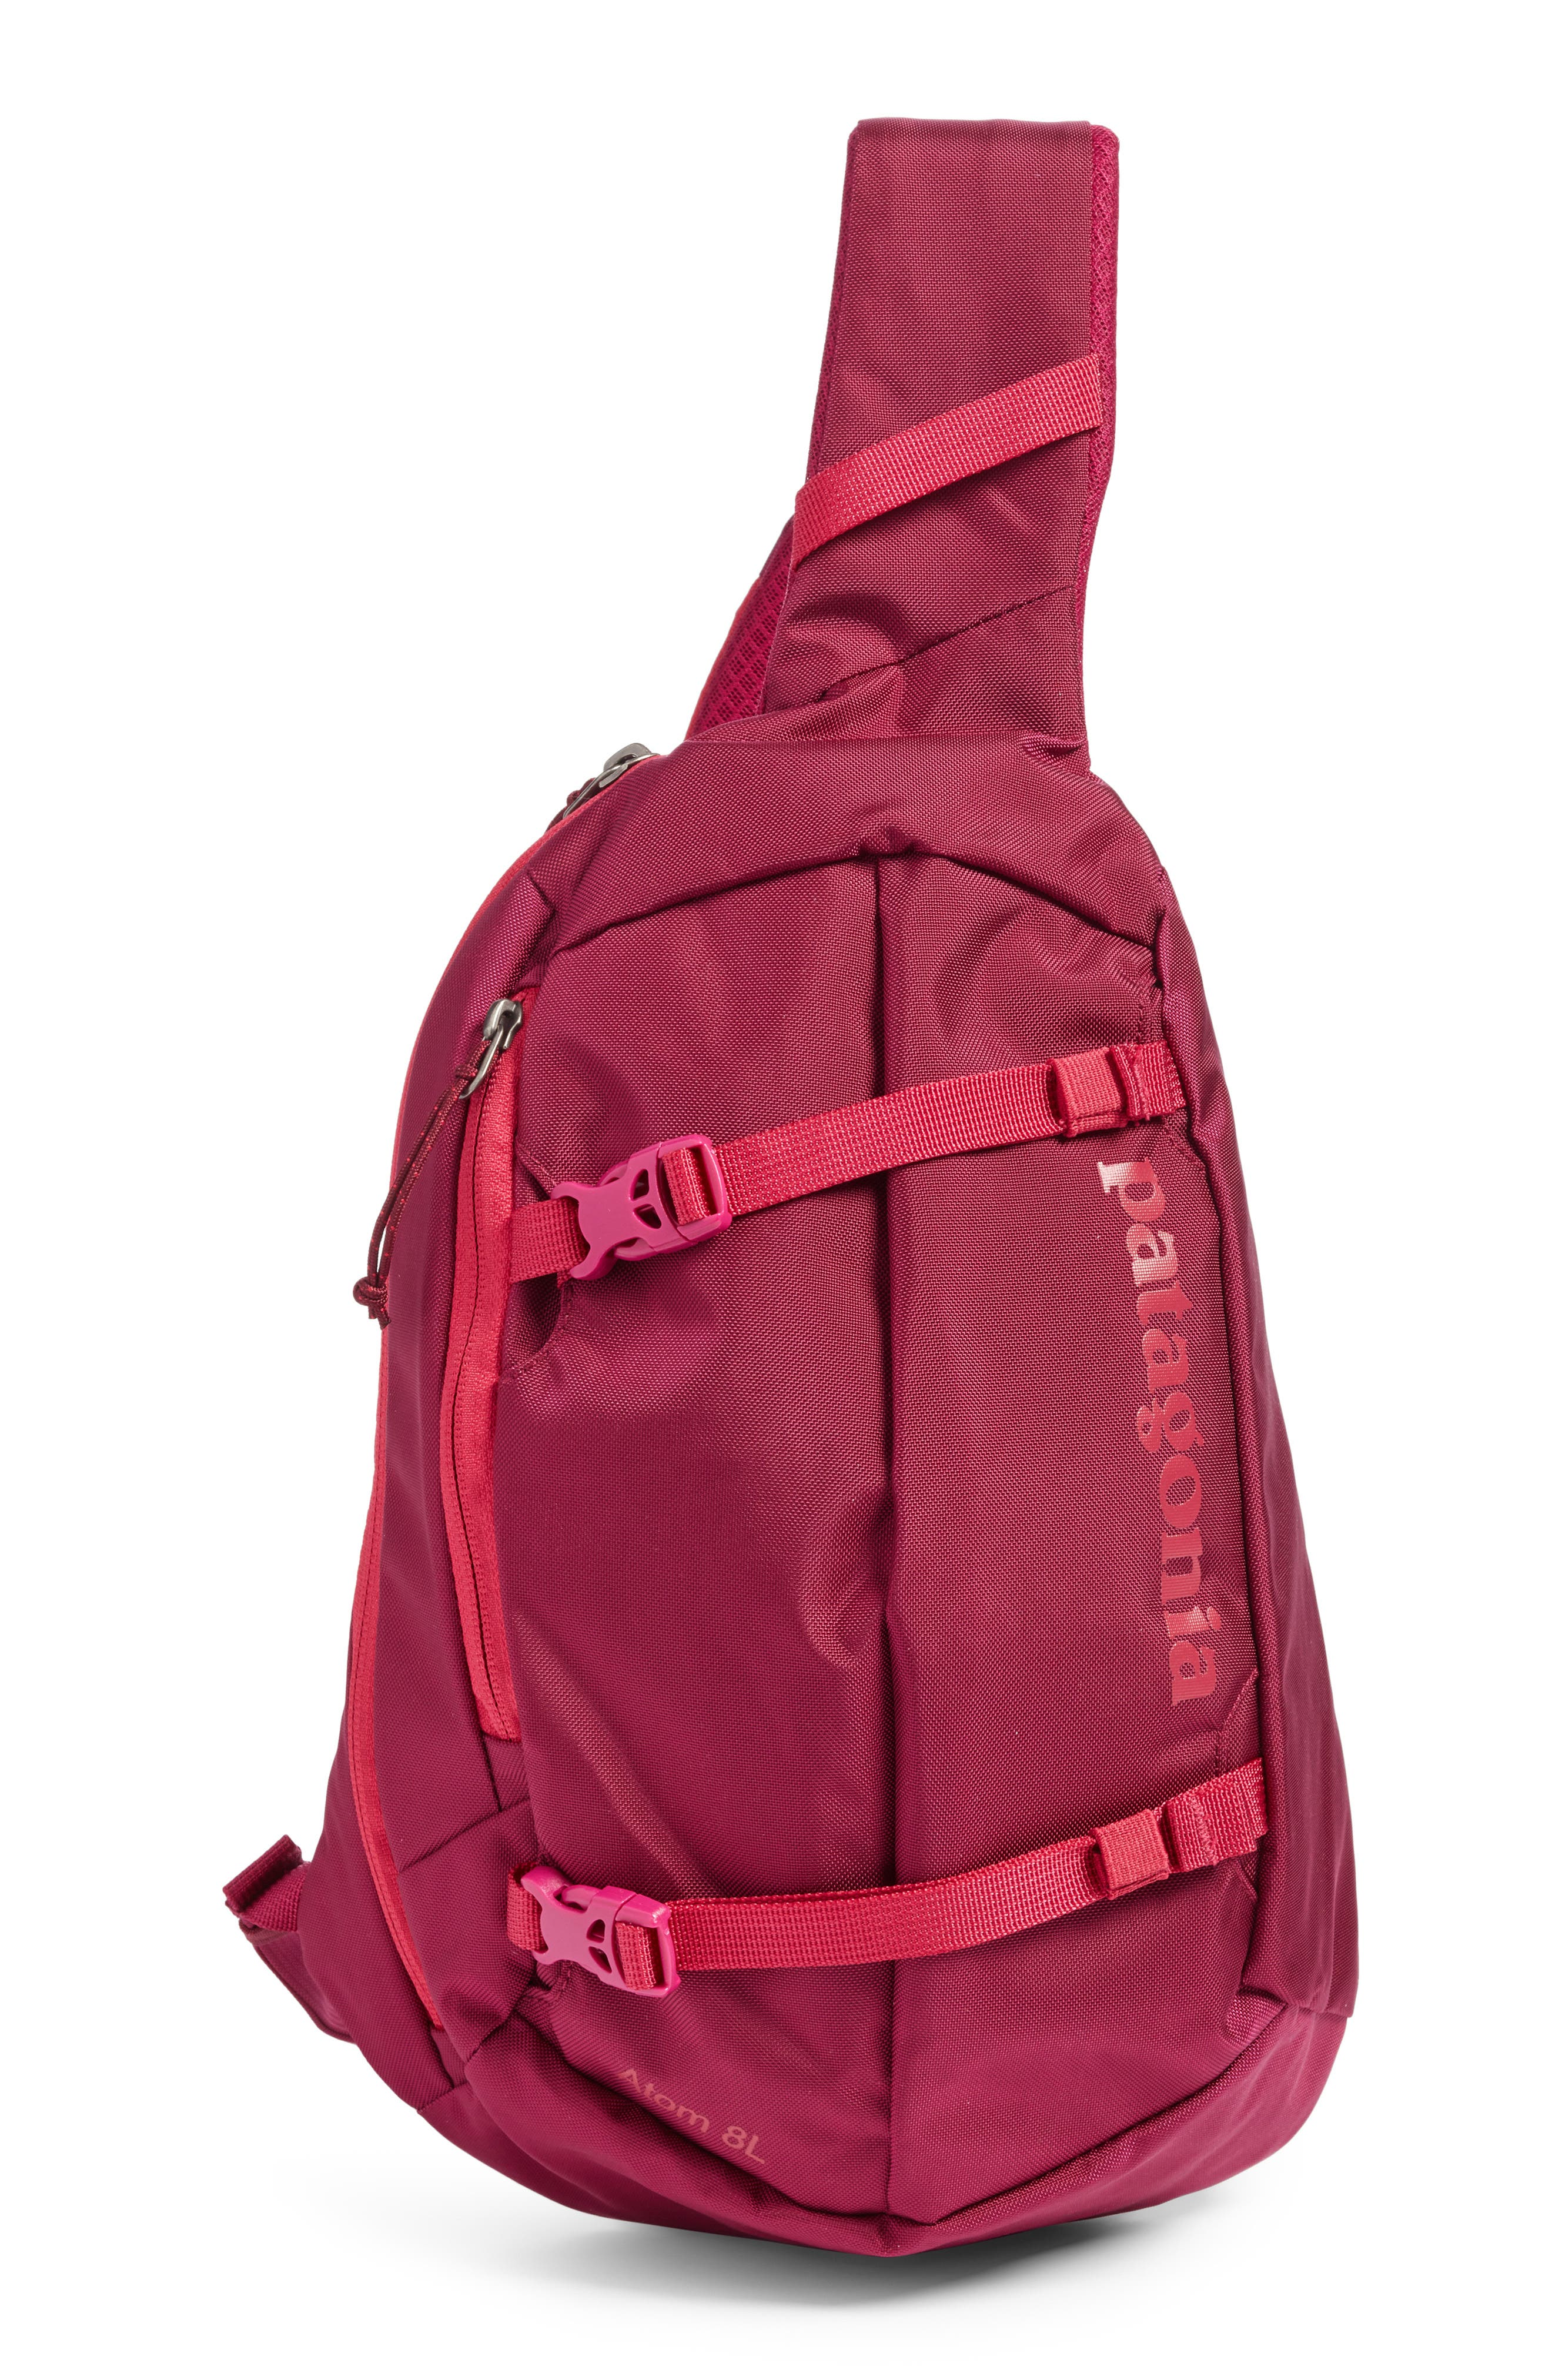 Atom 8L Sling Backpack,                             Main thumbnail 1, color,                             Magenta